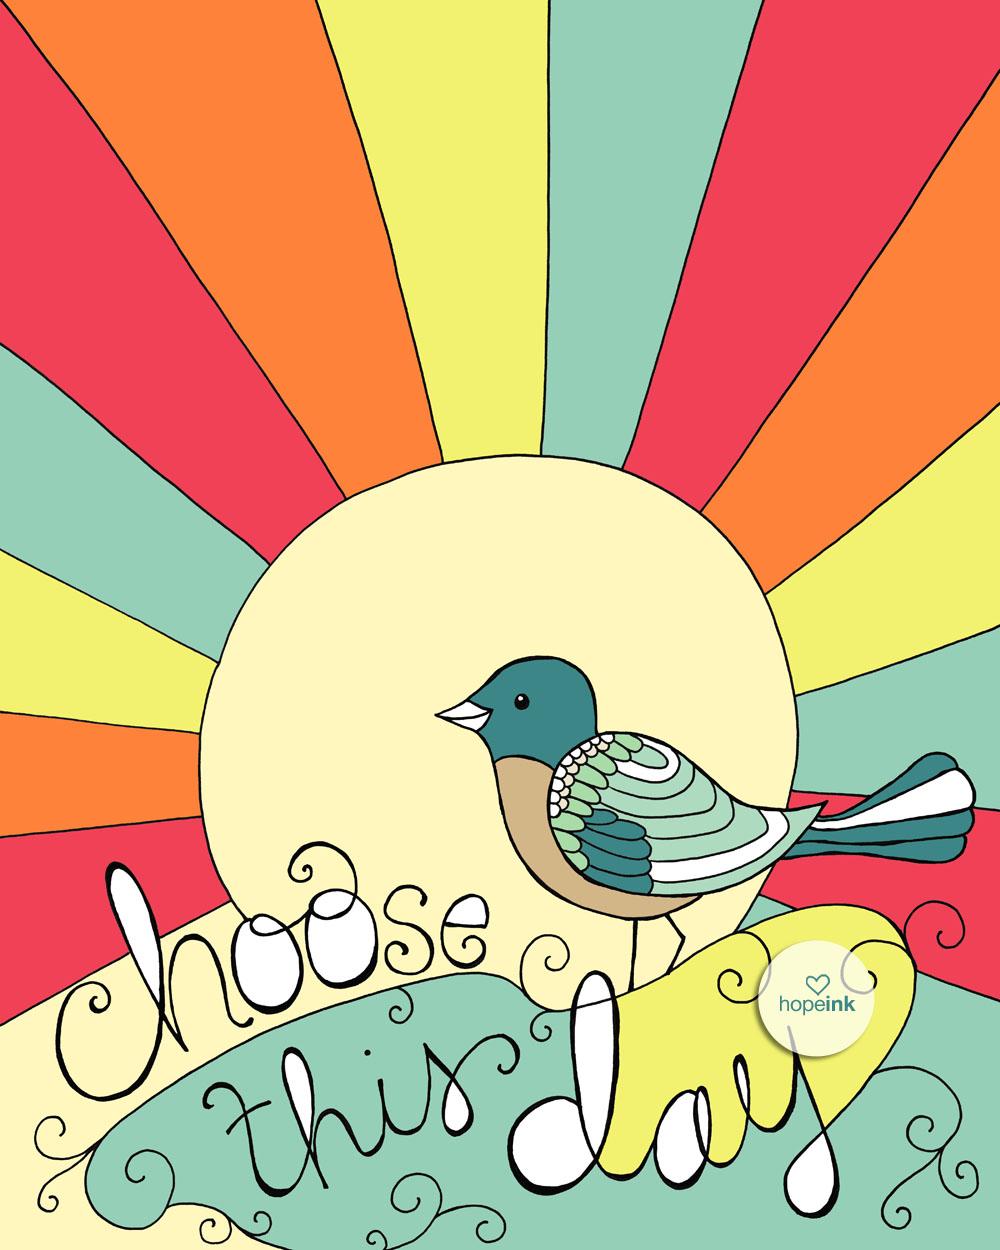 Choose_This_Day_Rainbow_hopeink.jpg